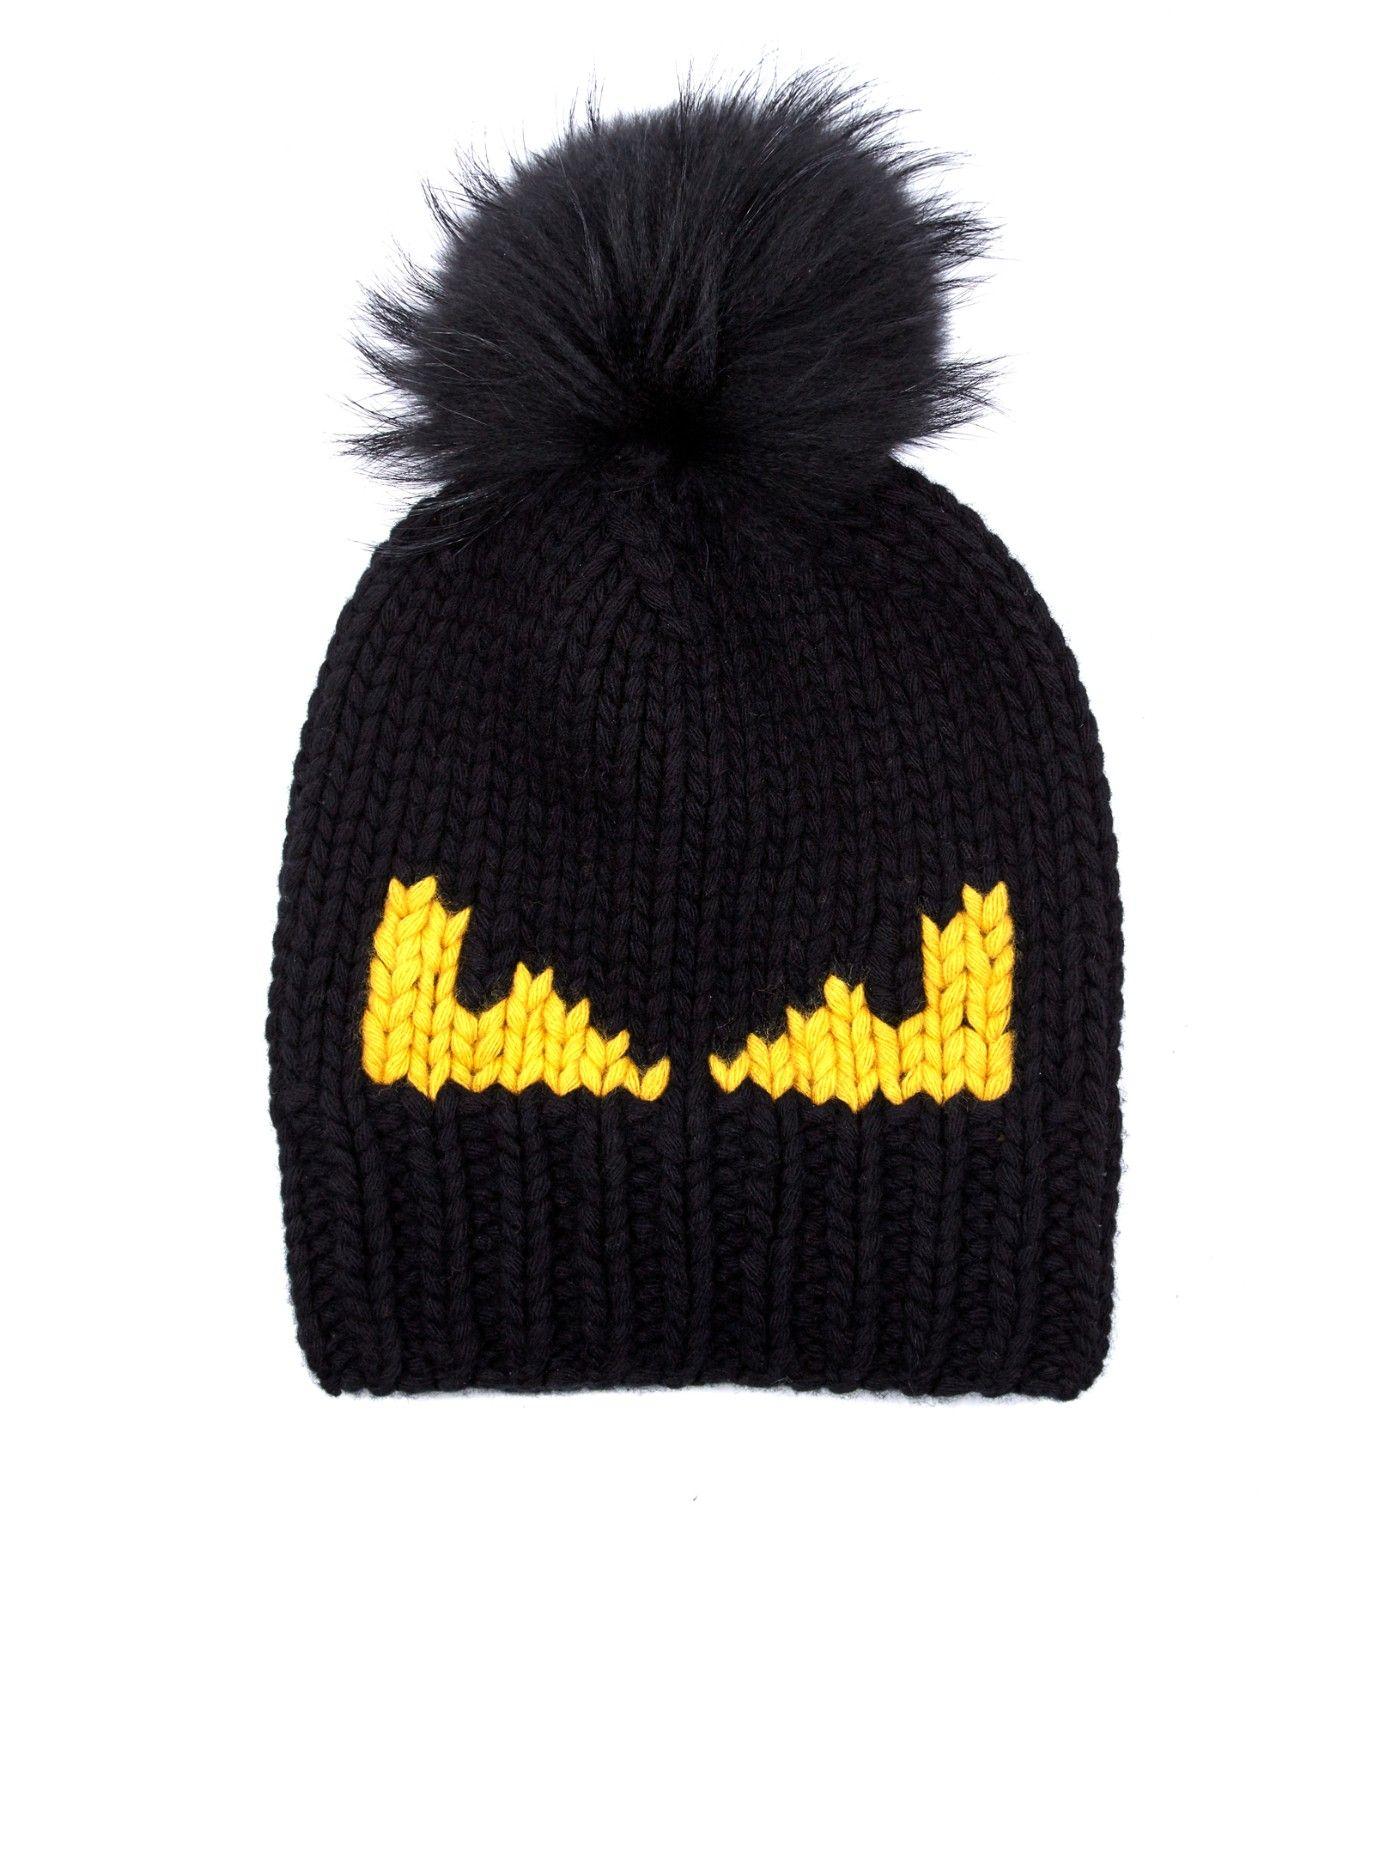 4e44cc55965 Monster-intarsia wool-knit beanie hat